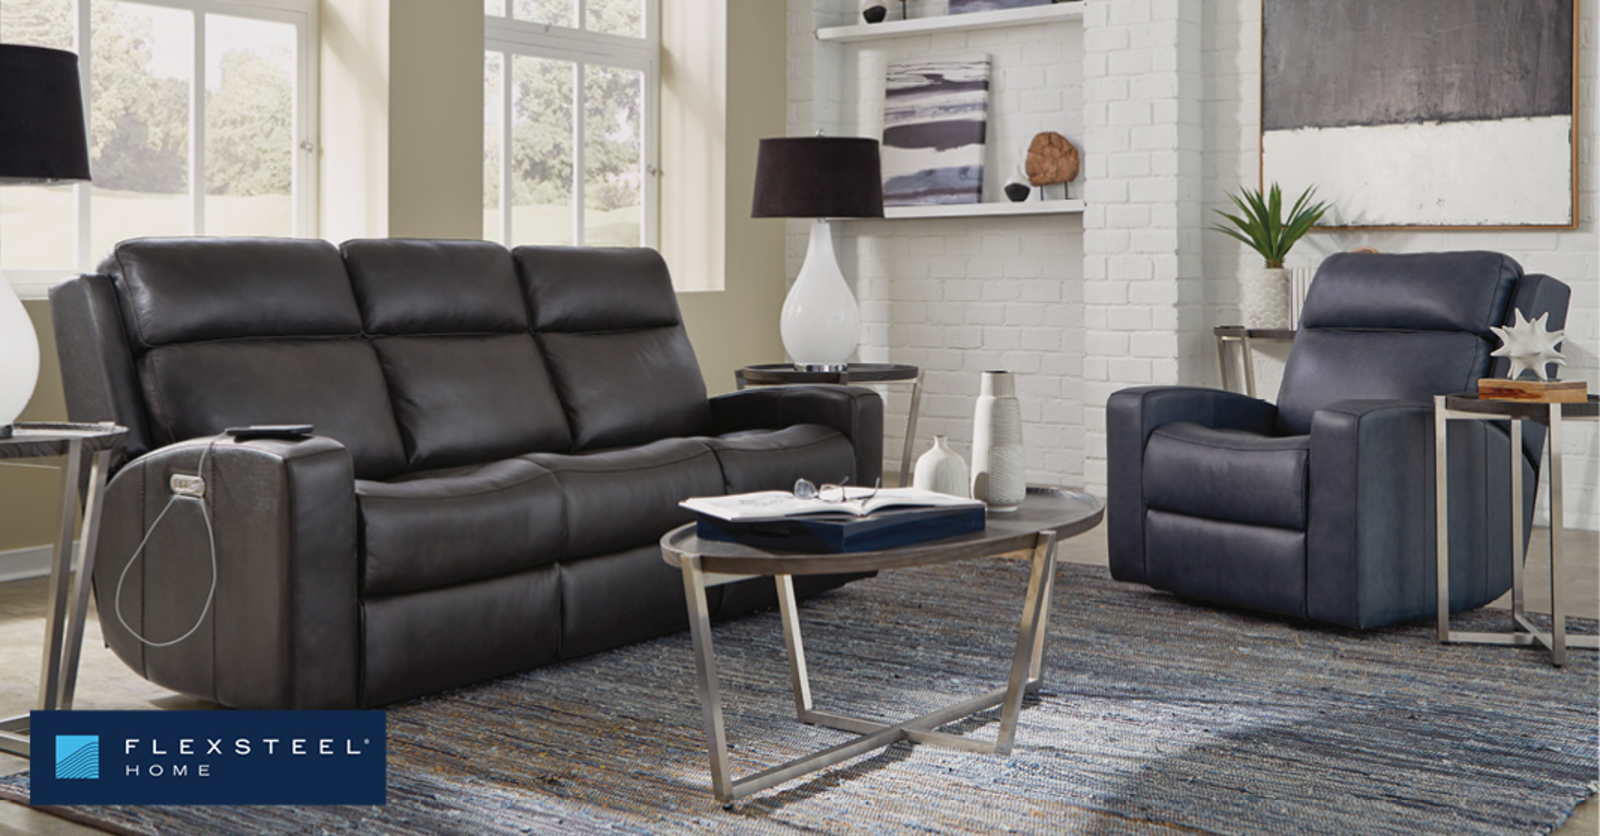 Flexsteel Motion Living Room